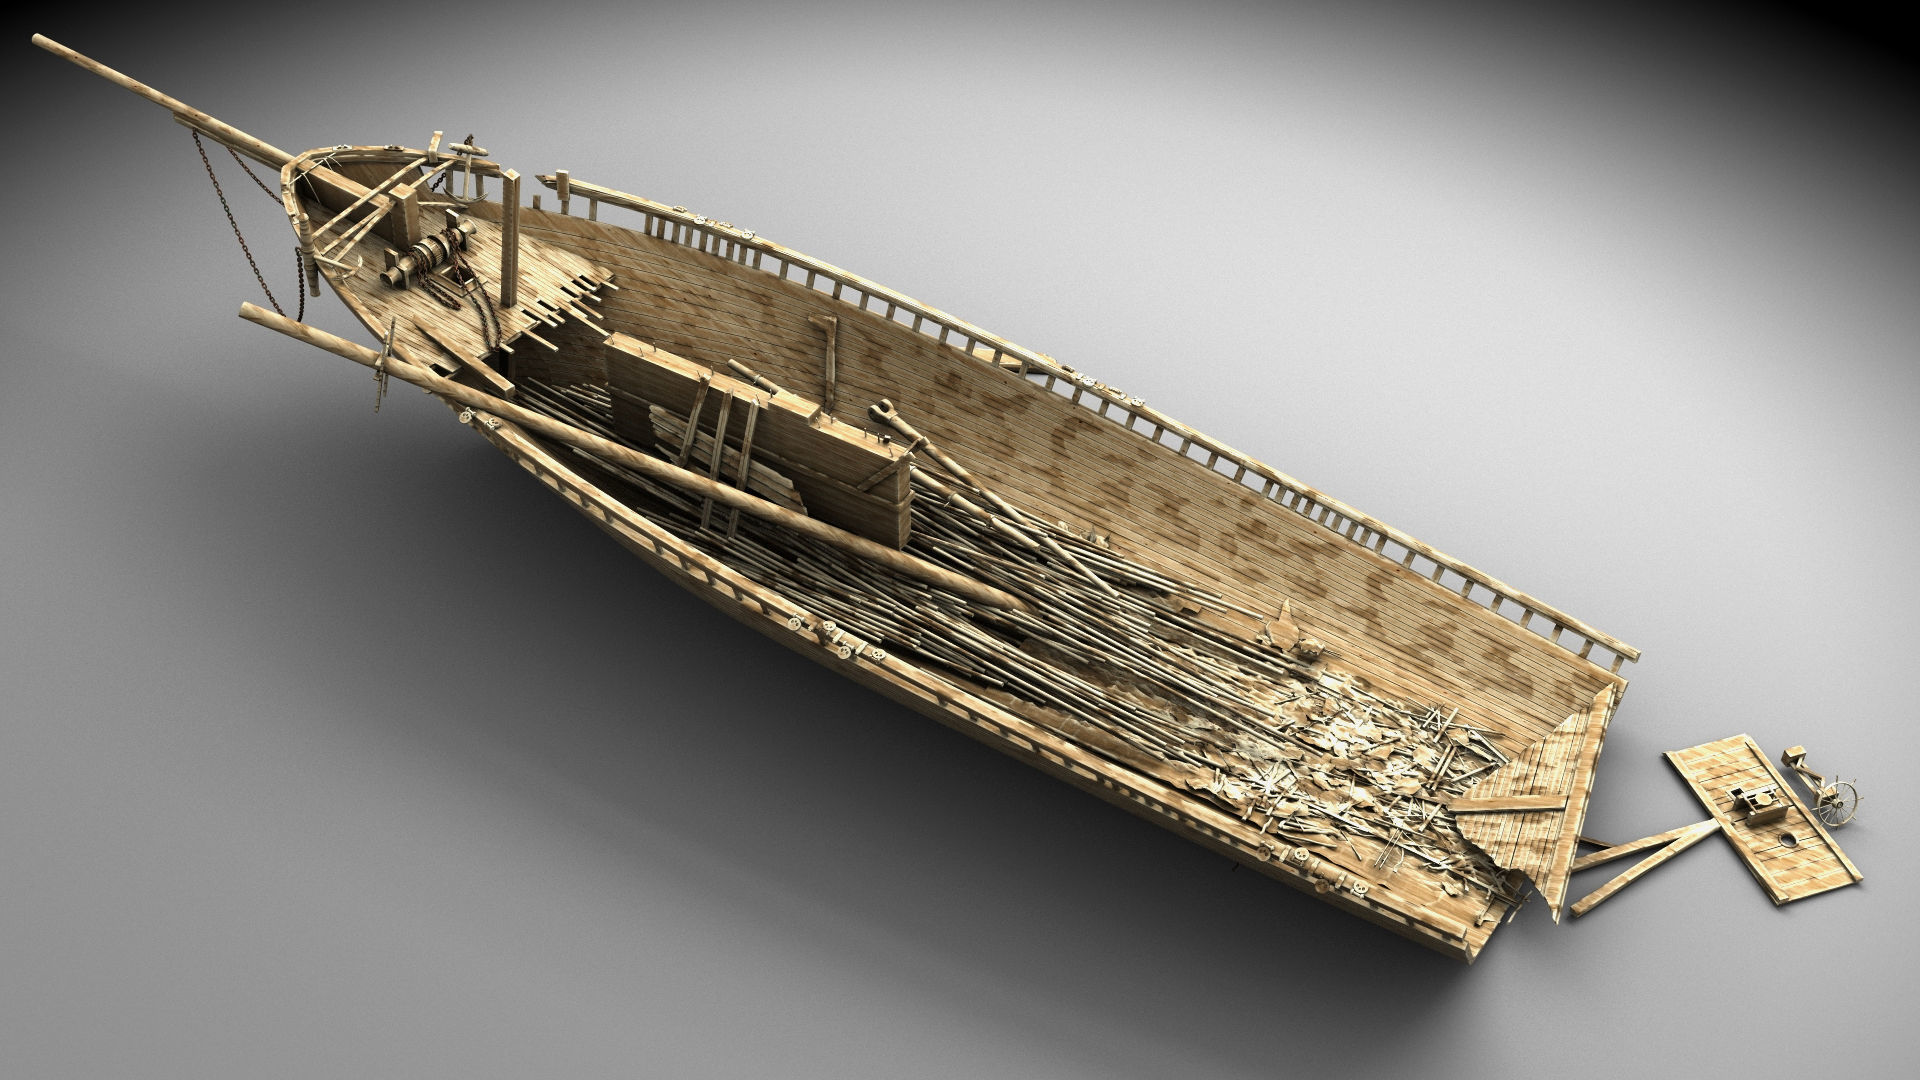 Wooden shipwreck 2